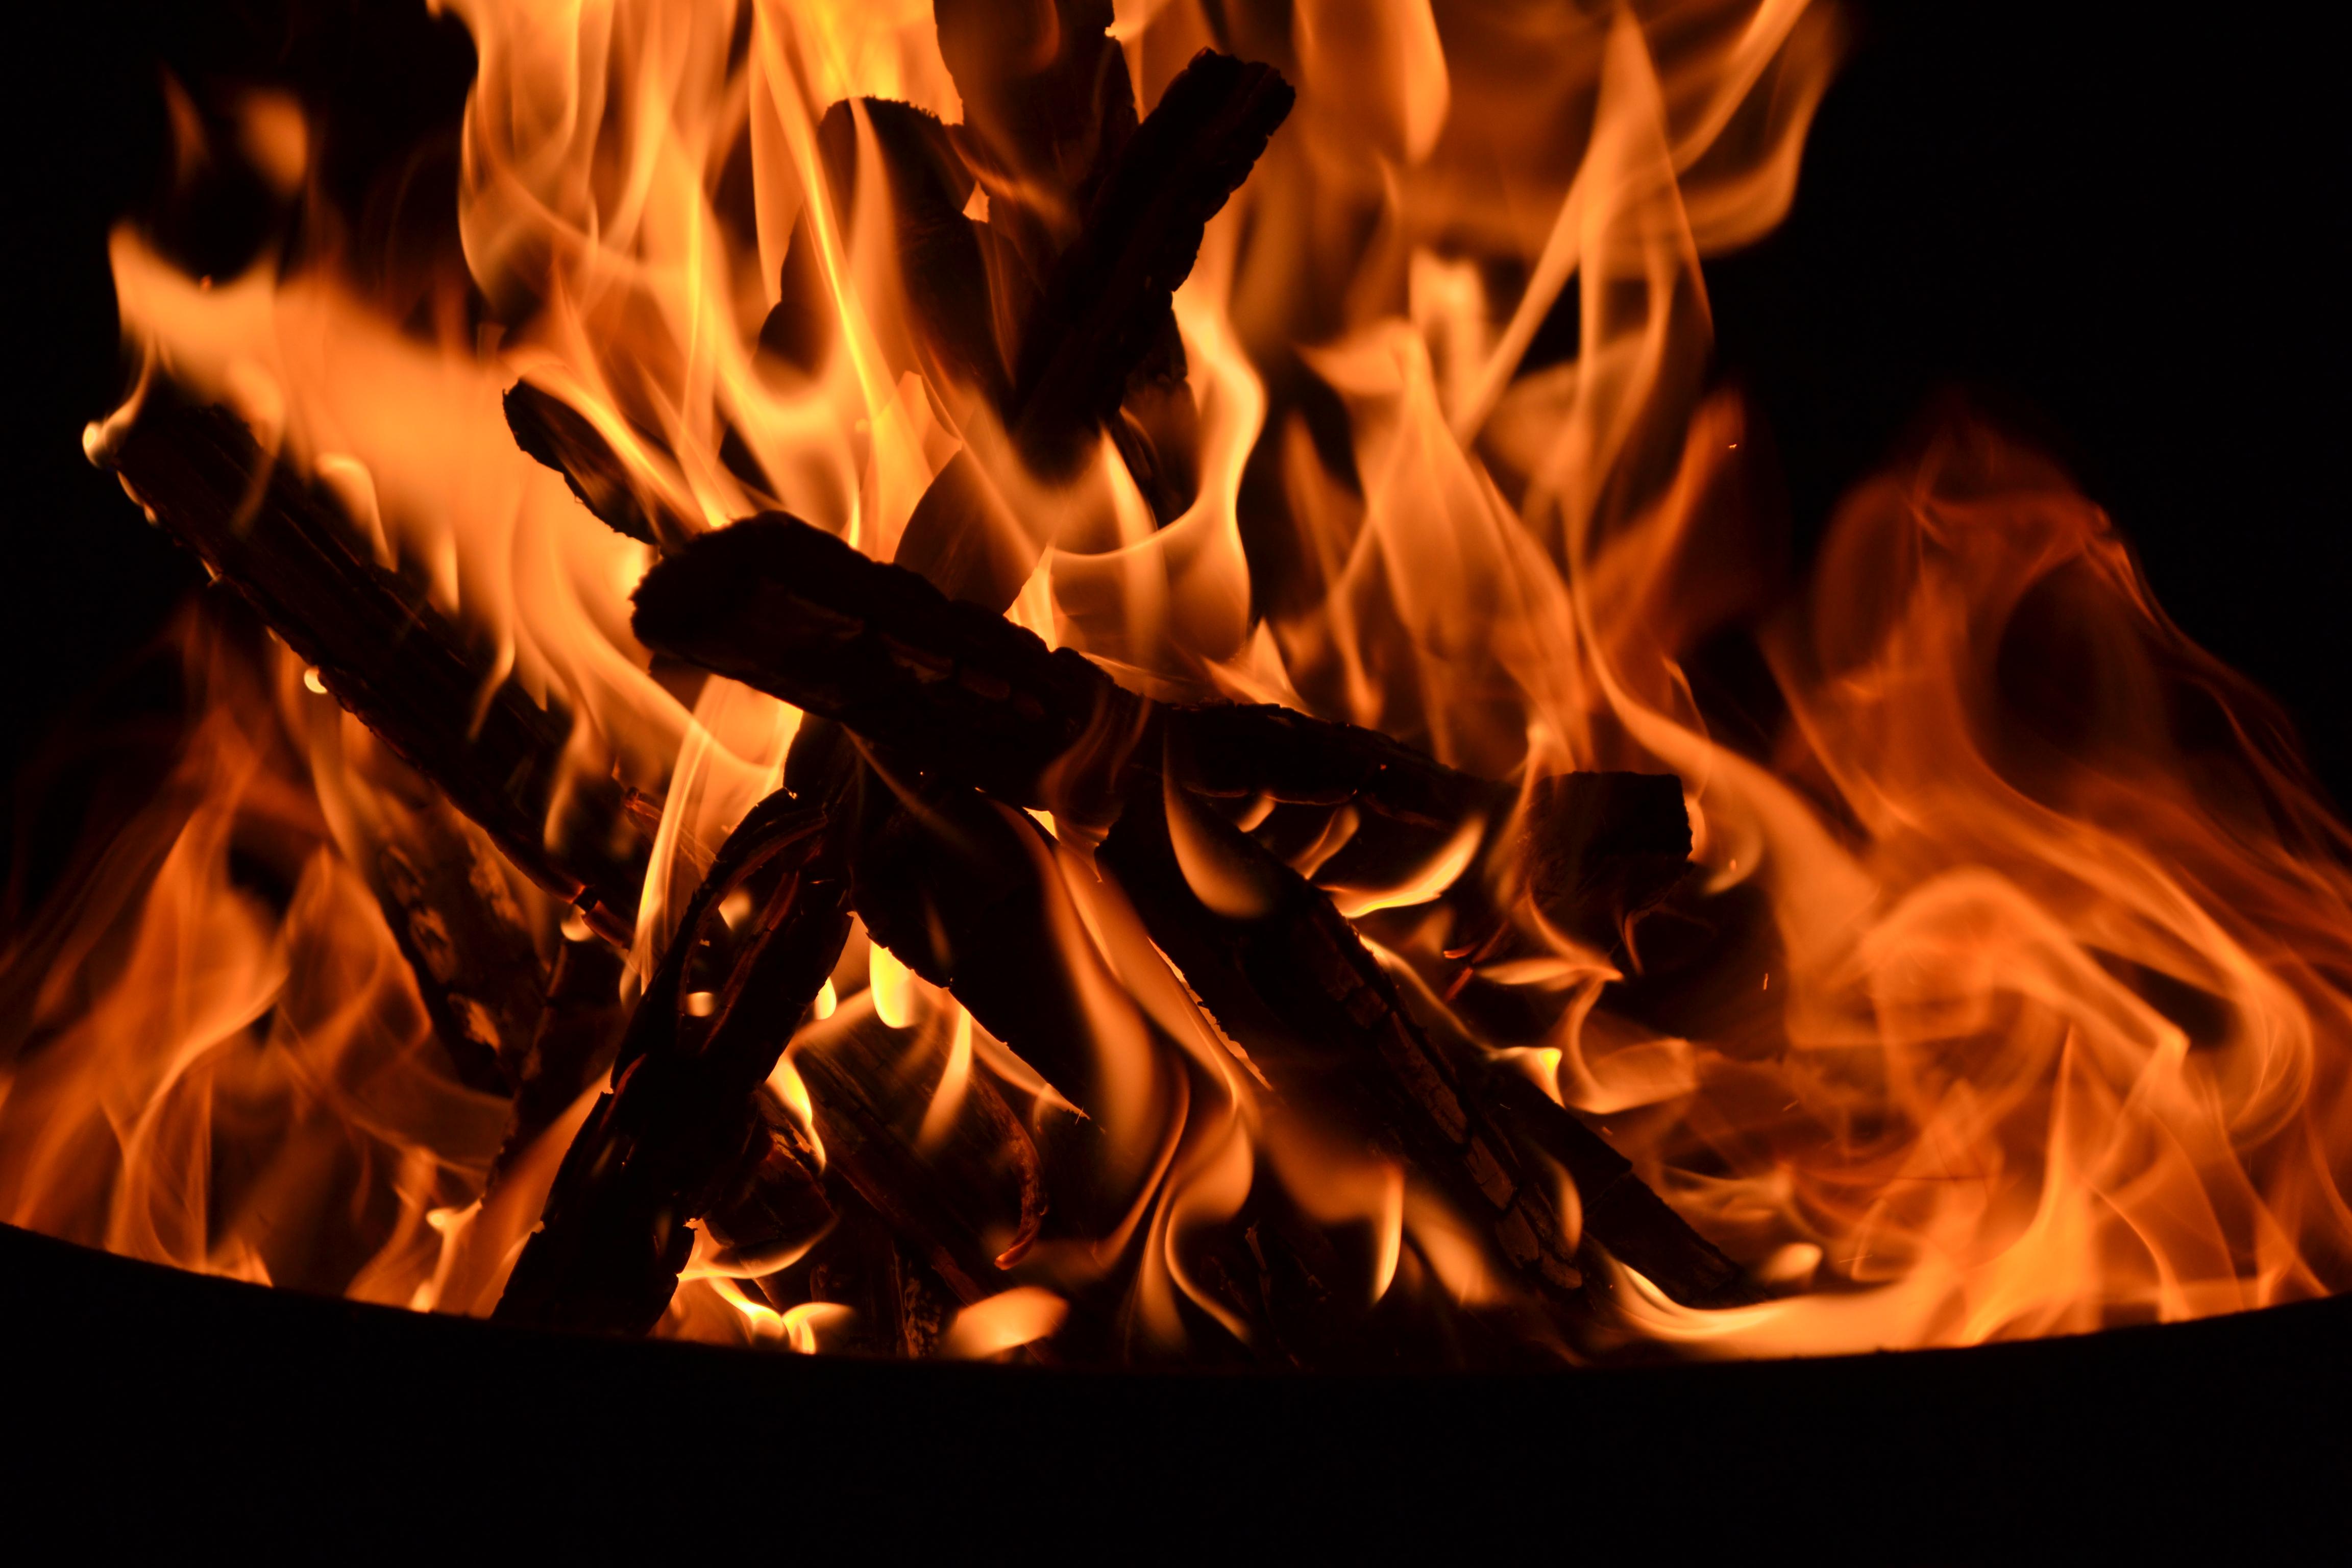 Fire - Burning Wood, Hot, Night, Flames, Flame, HQ Photo